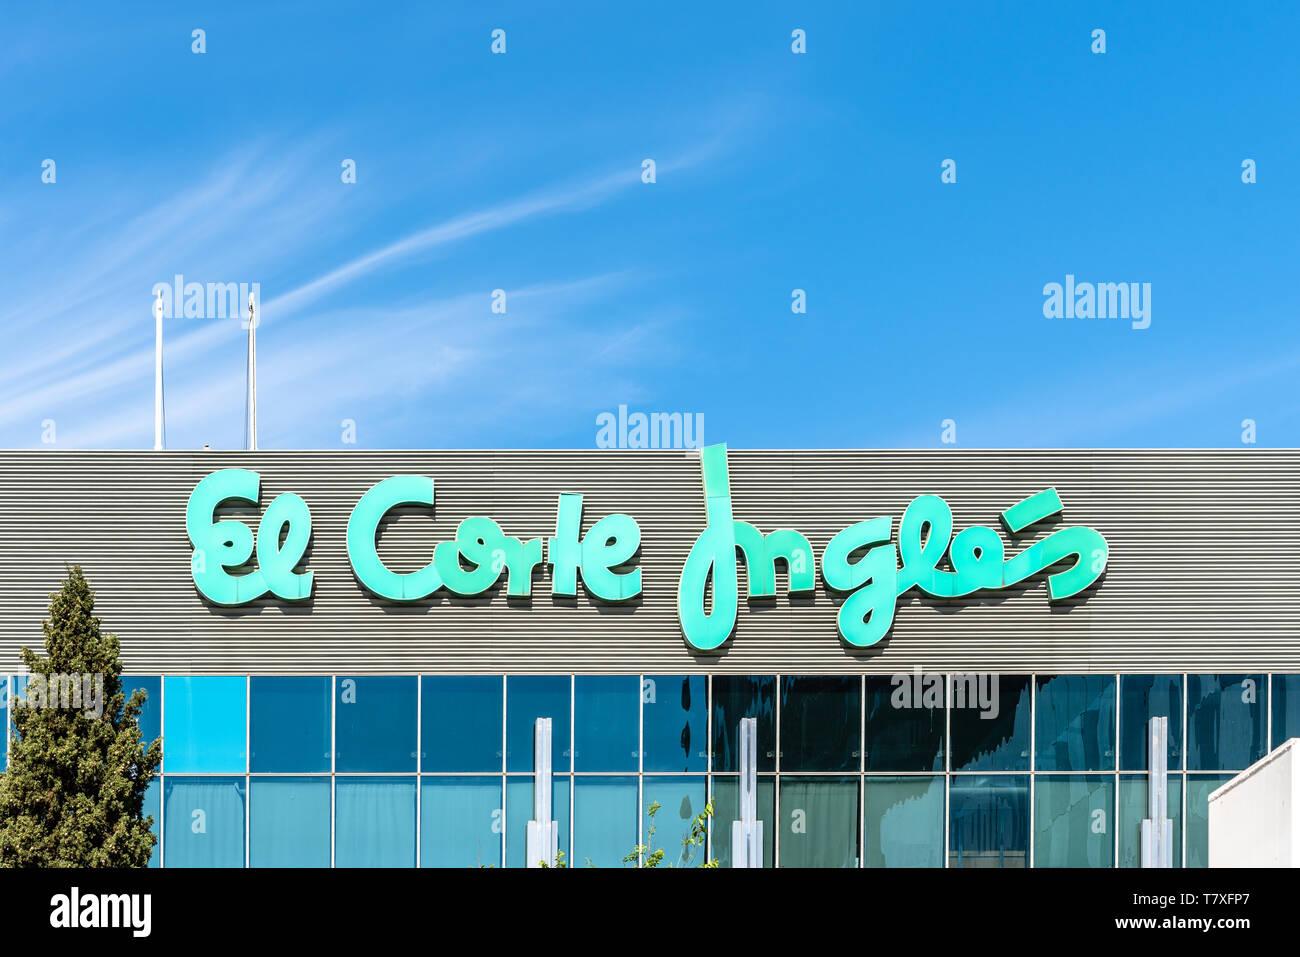 Madrid, Spain - May 1, 2019: El Corte Ingles department store in Castellana, Madrid. El Corte Ingles is one of the biggest department store group in t Stock Photo